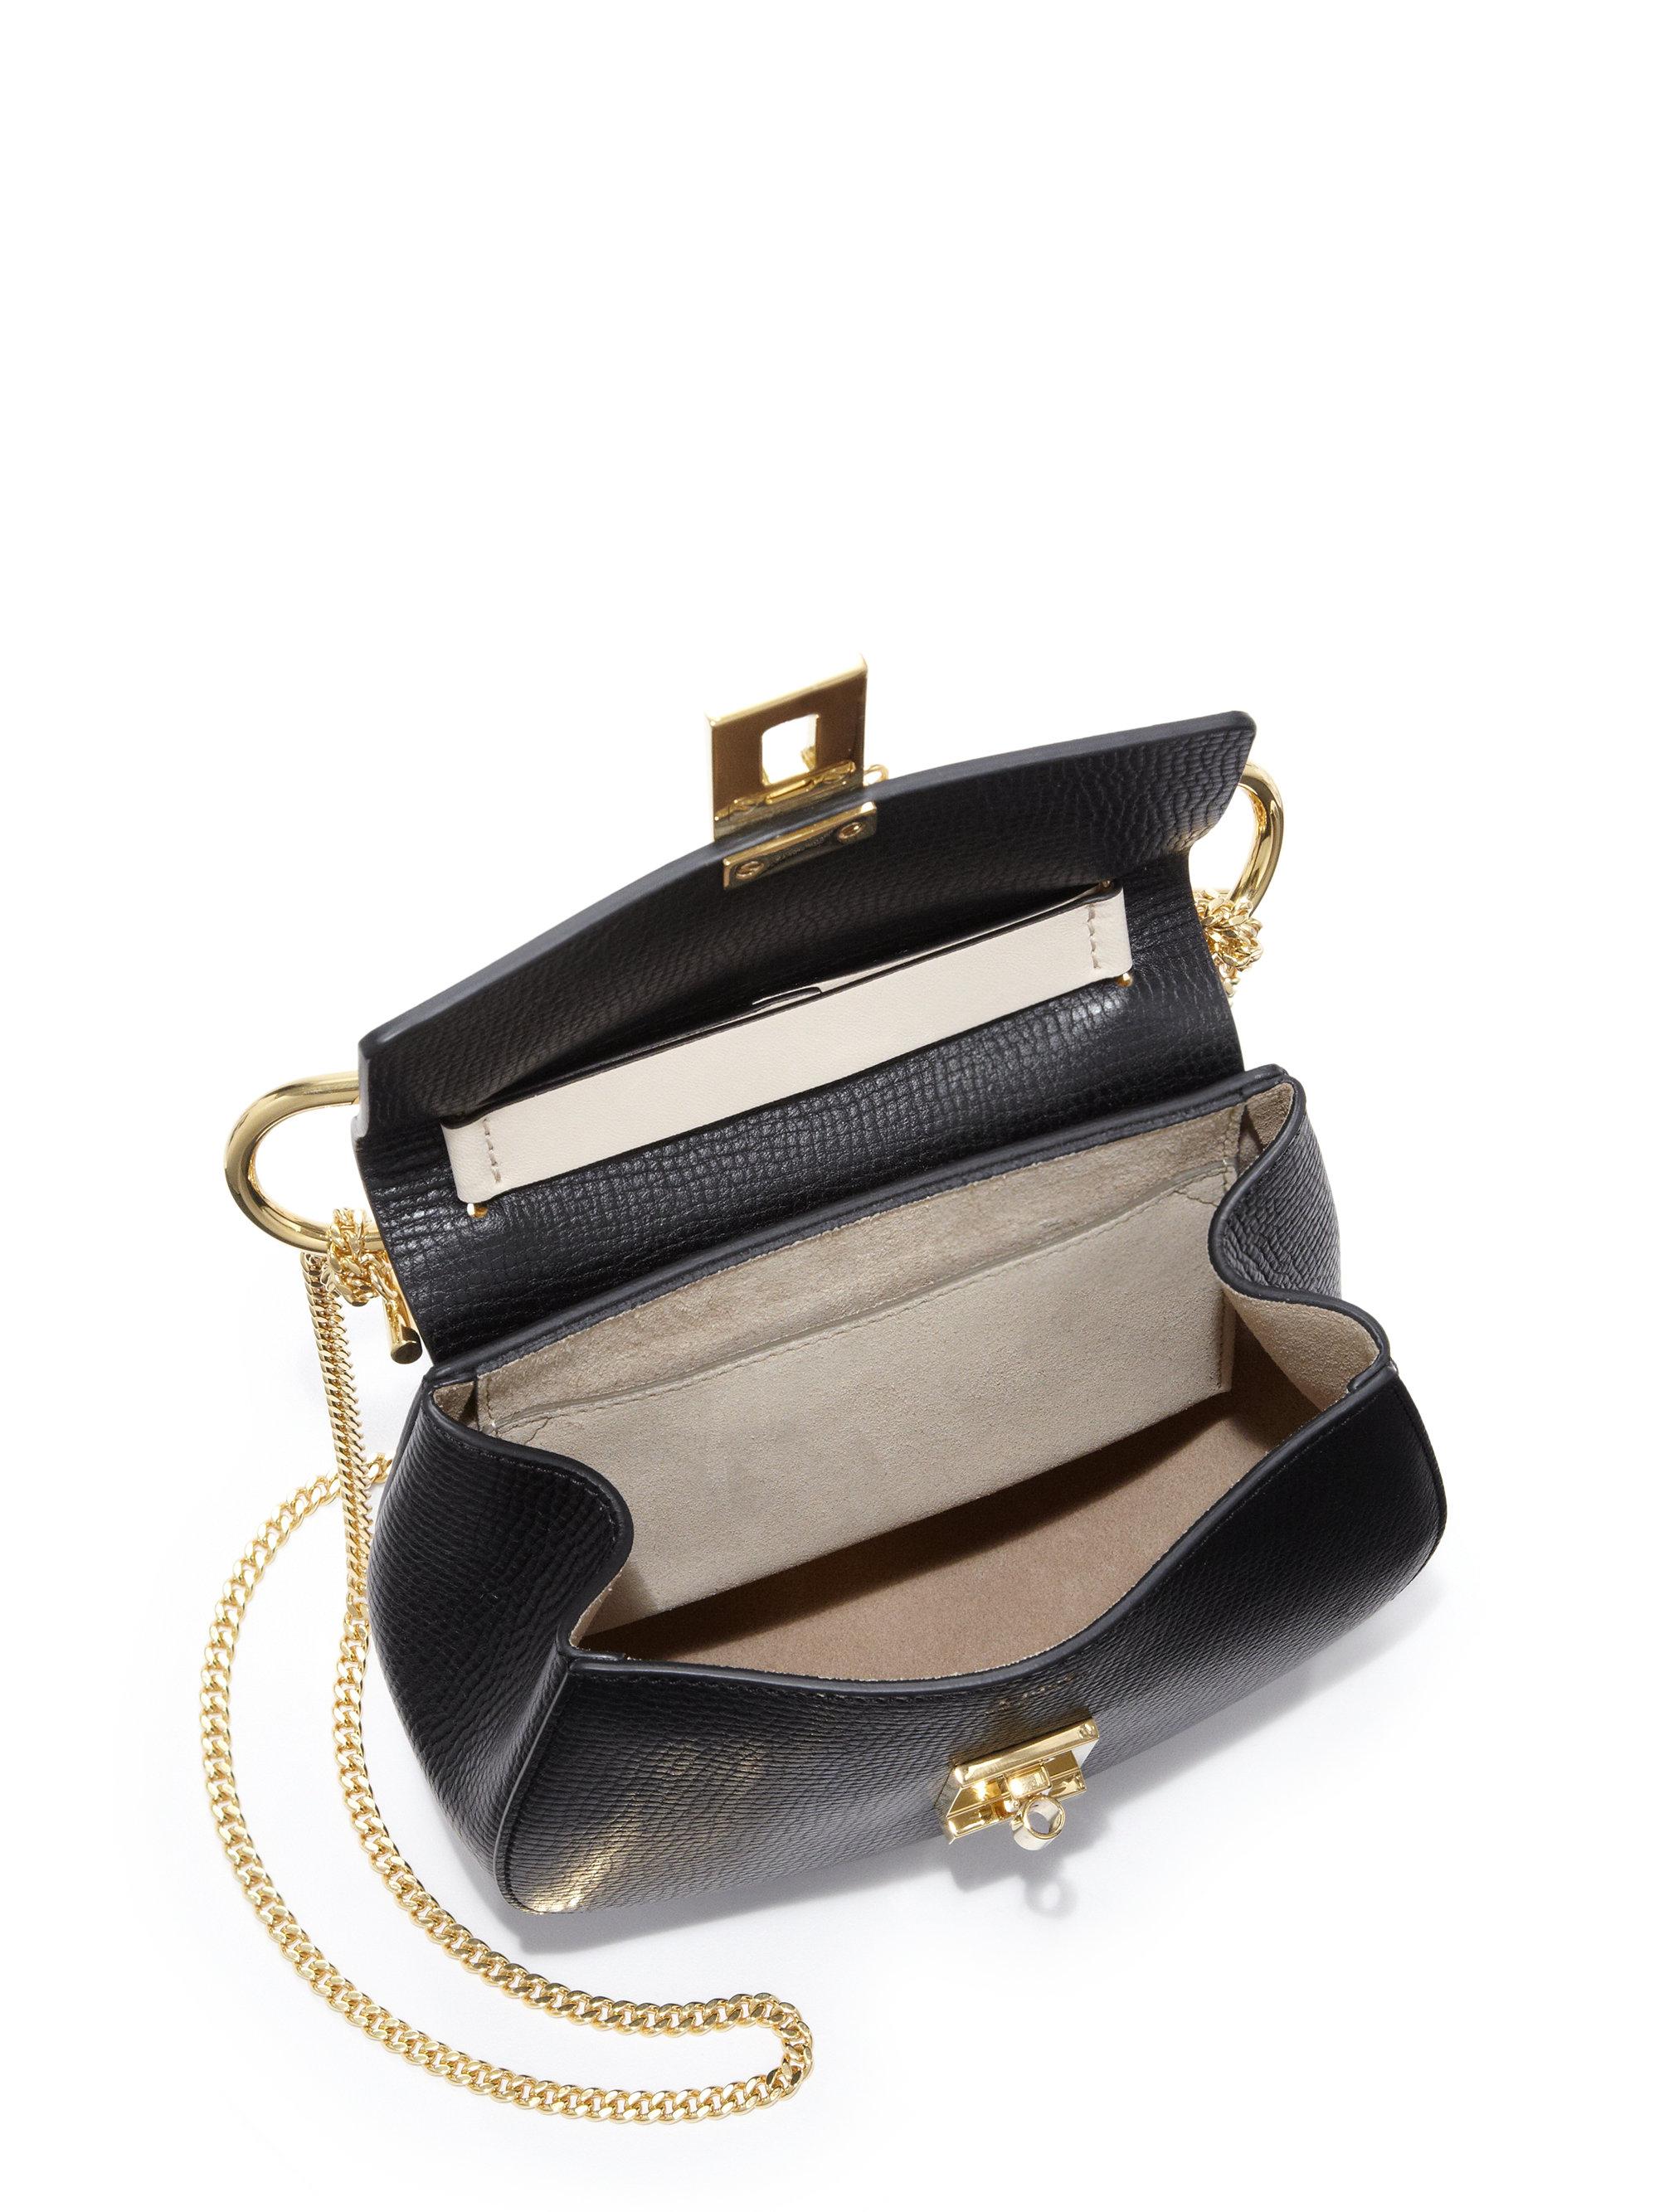 Chlo¨¦ Drew Mini Bicolor Crossbody Bag in Black (BLACK-CREAM)   Lyst